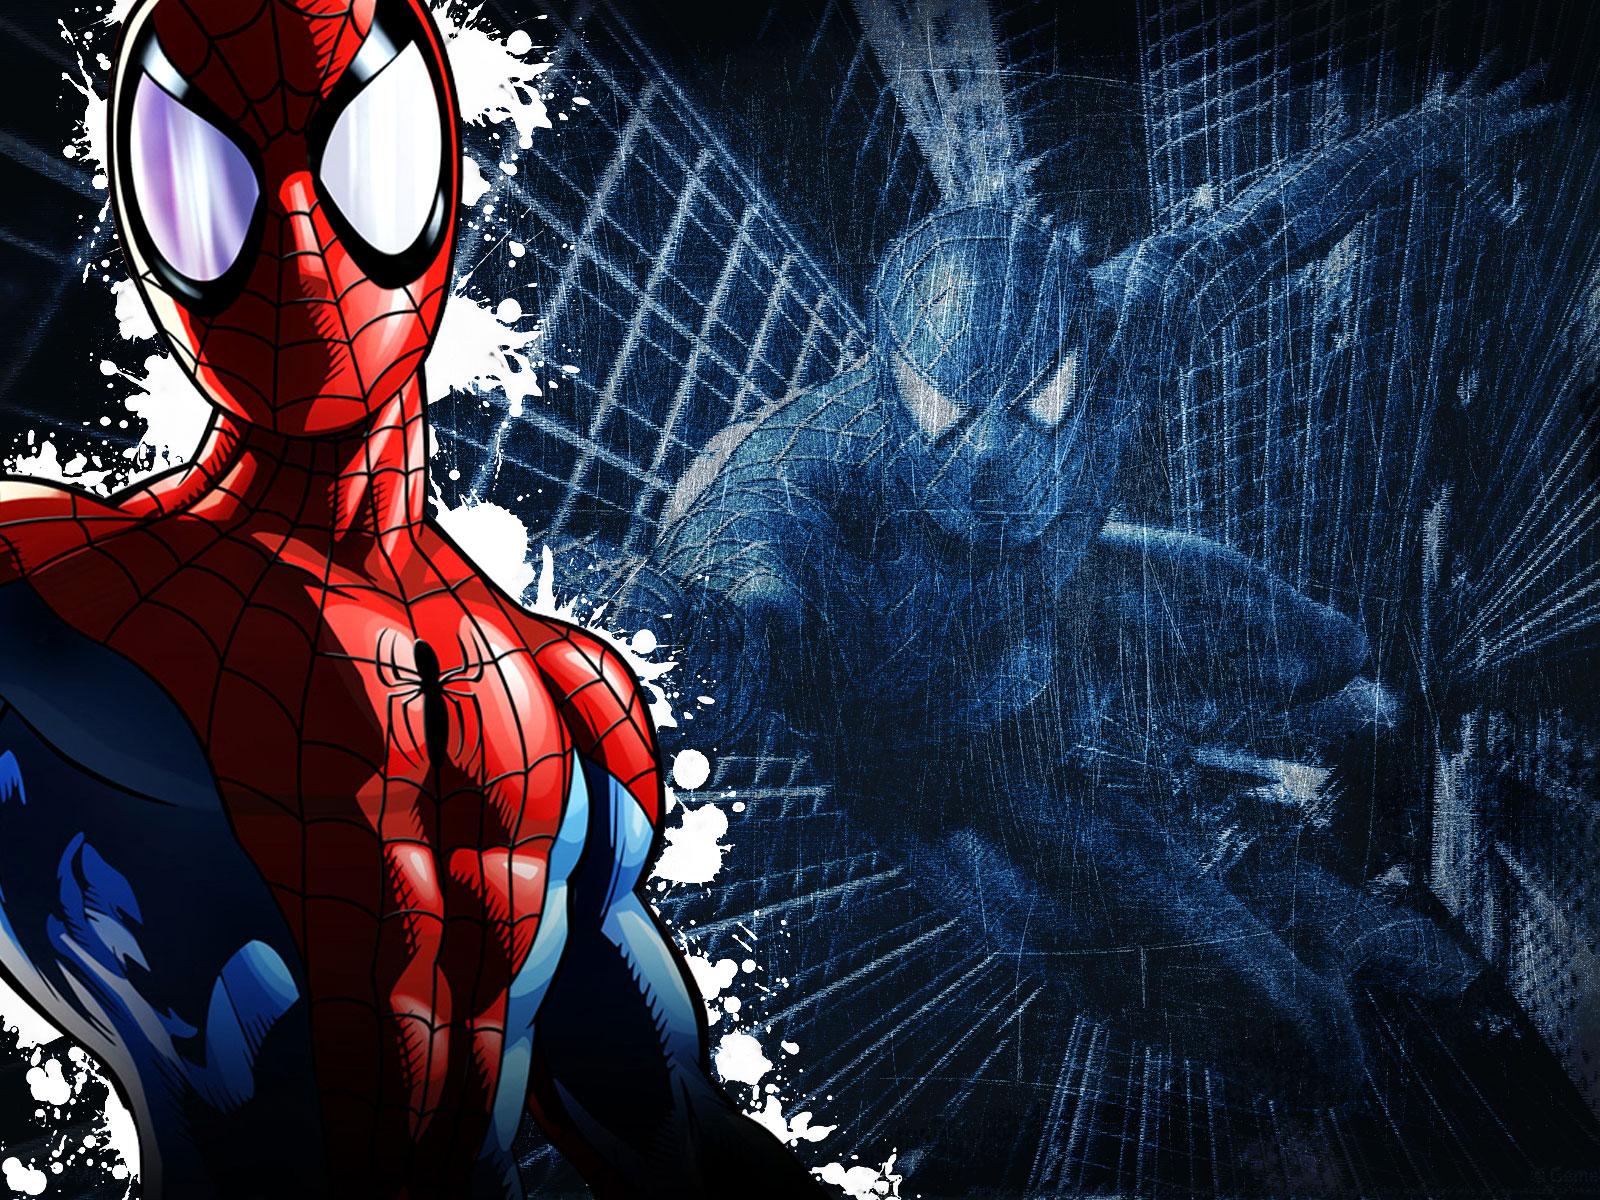 Spiderman wallpaper animate wallpaper for Fondos de spiderman